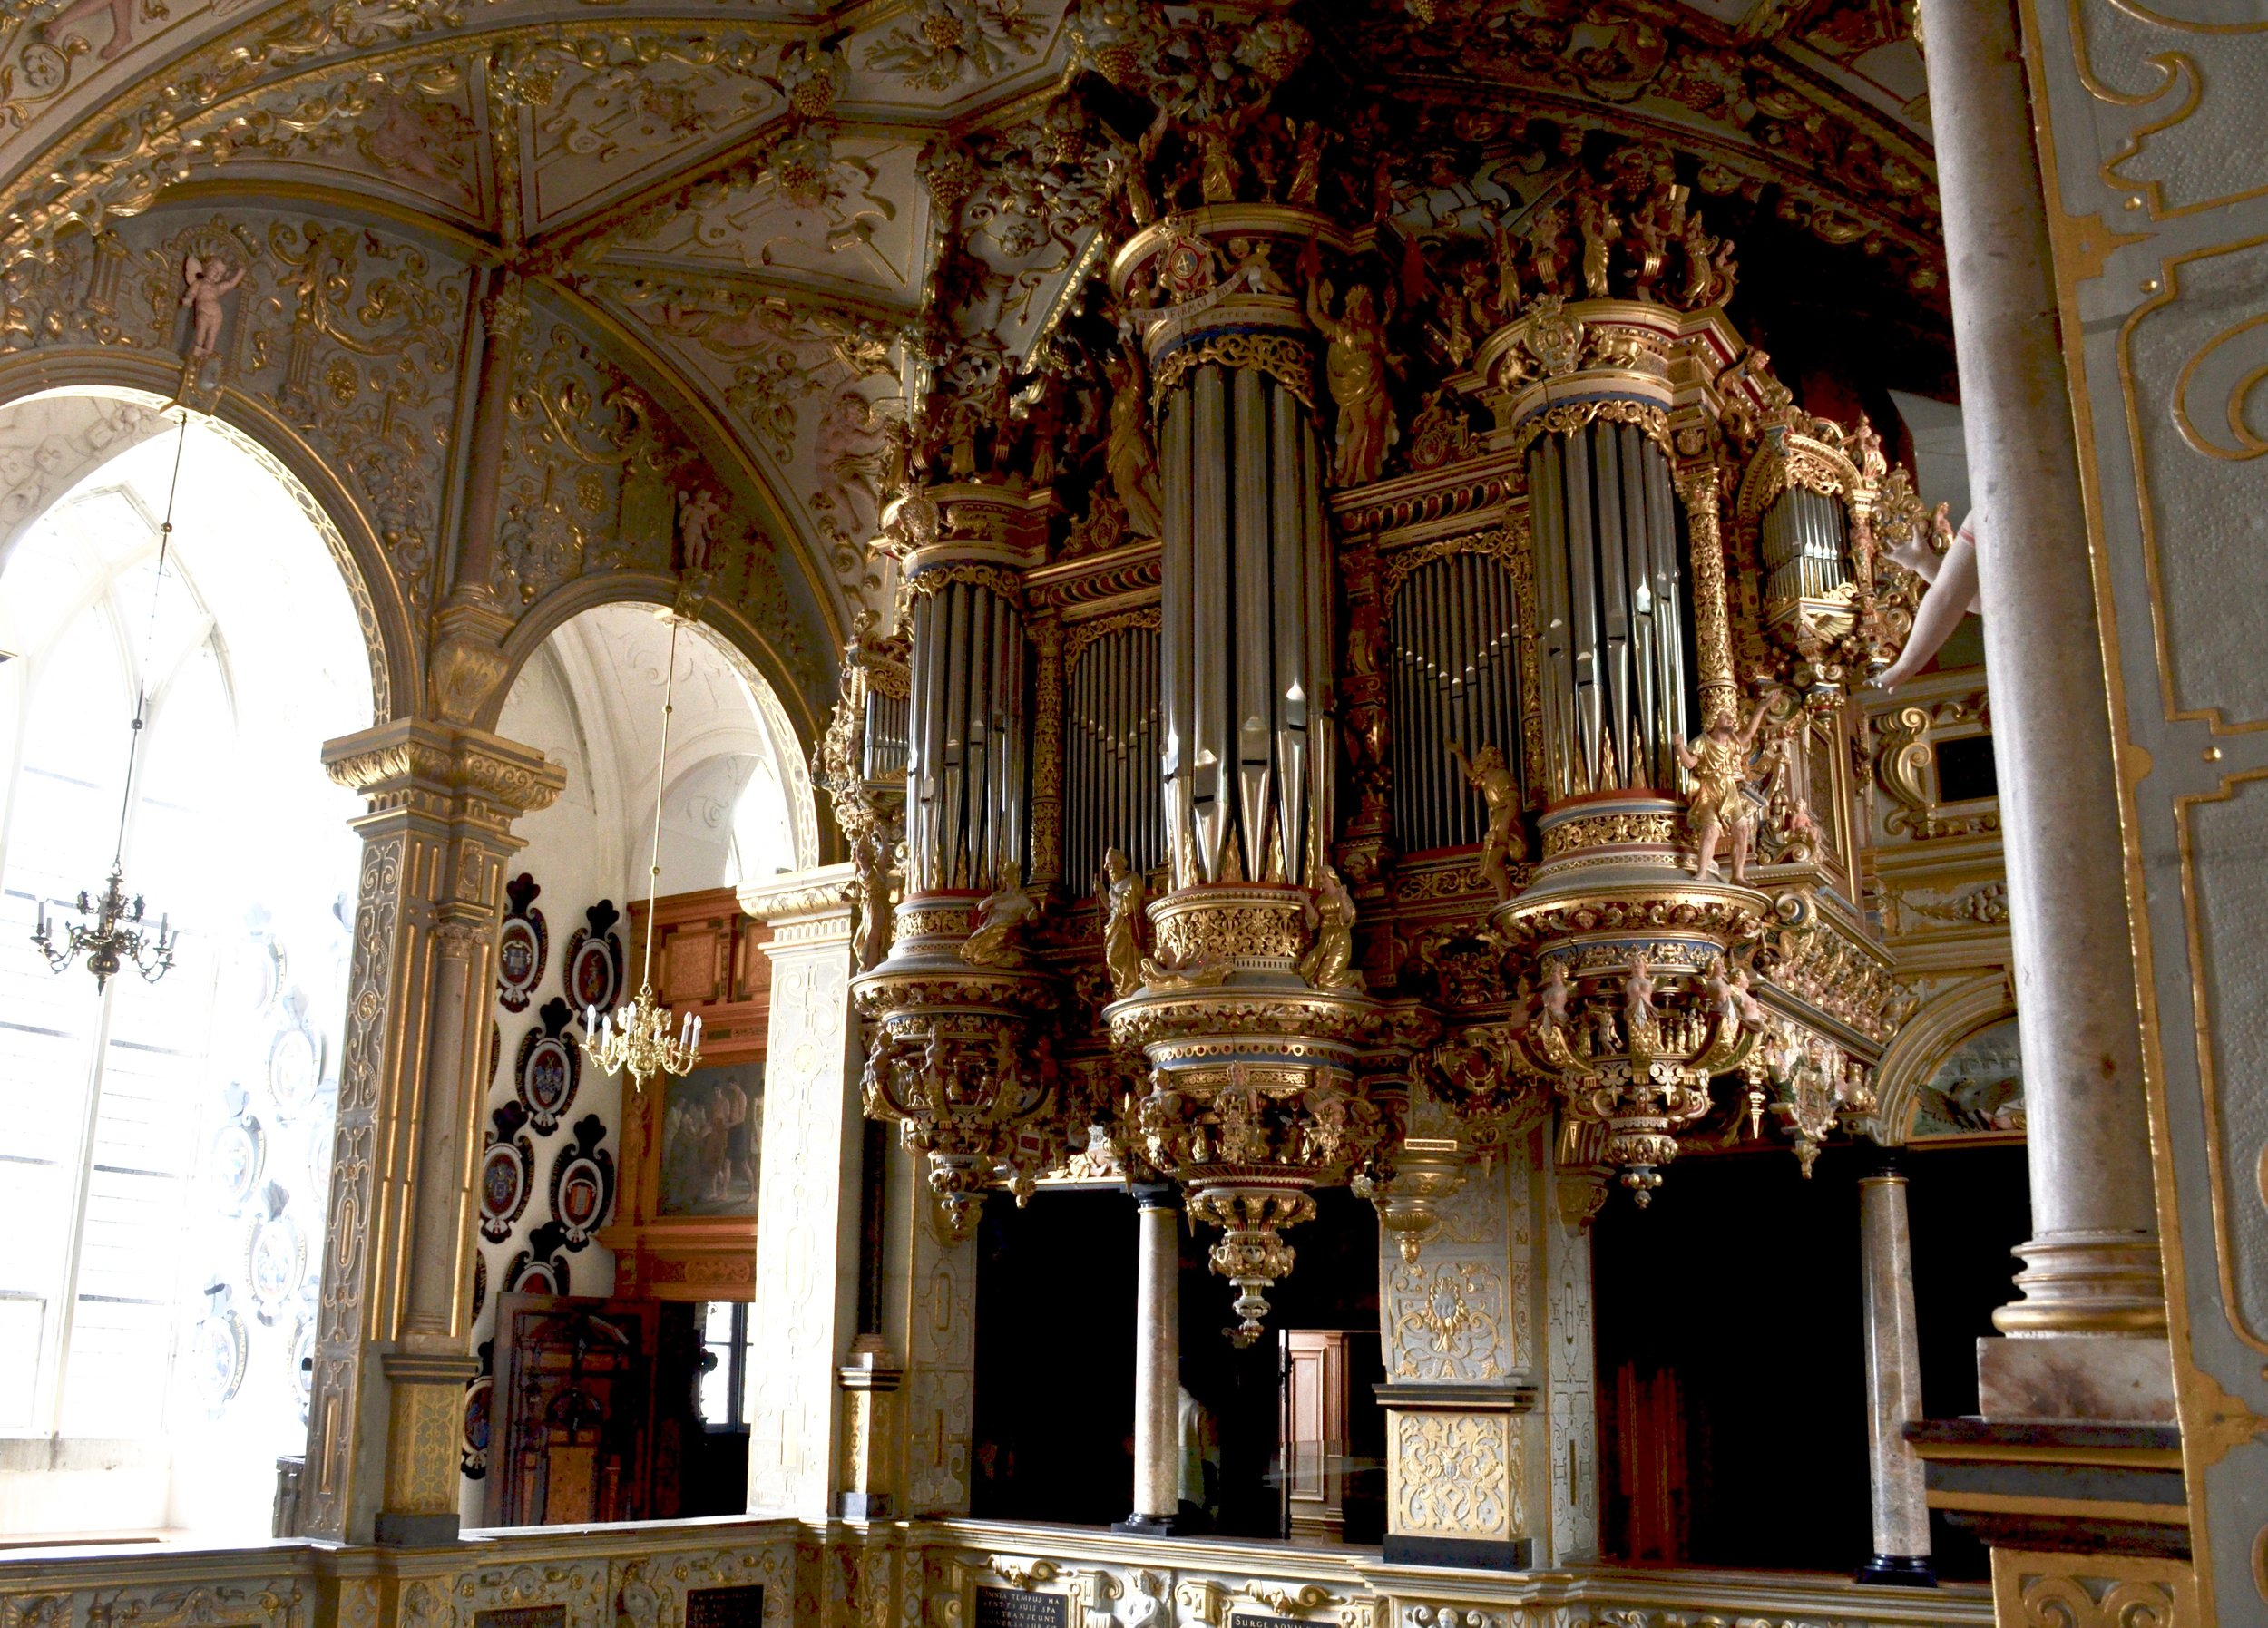 Chapel, Frederiksborg Castle, Hillerød, Denmark.